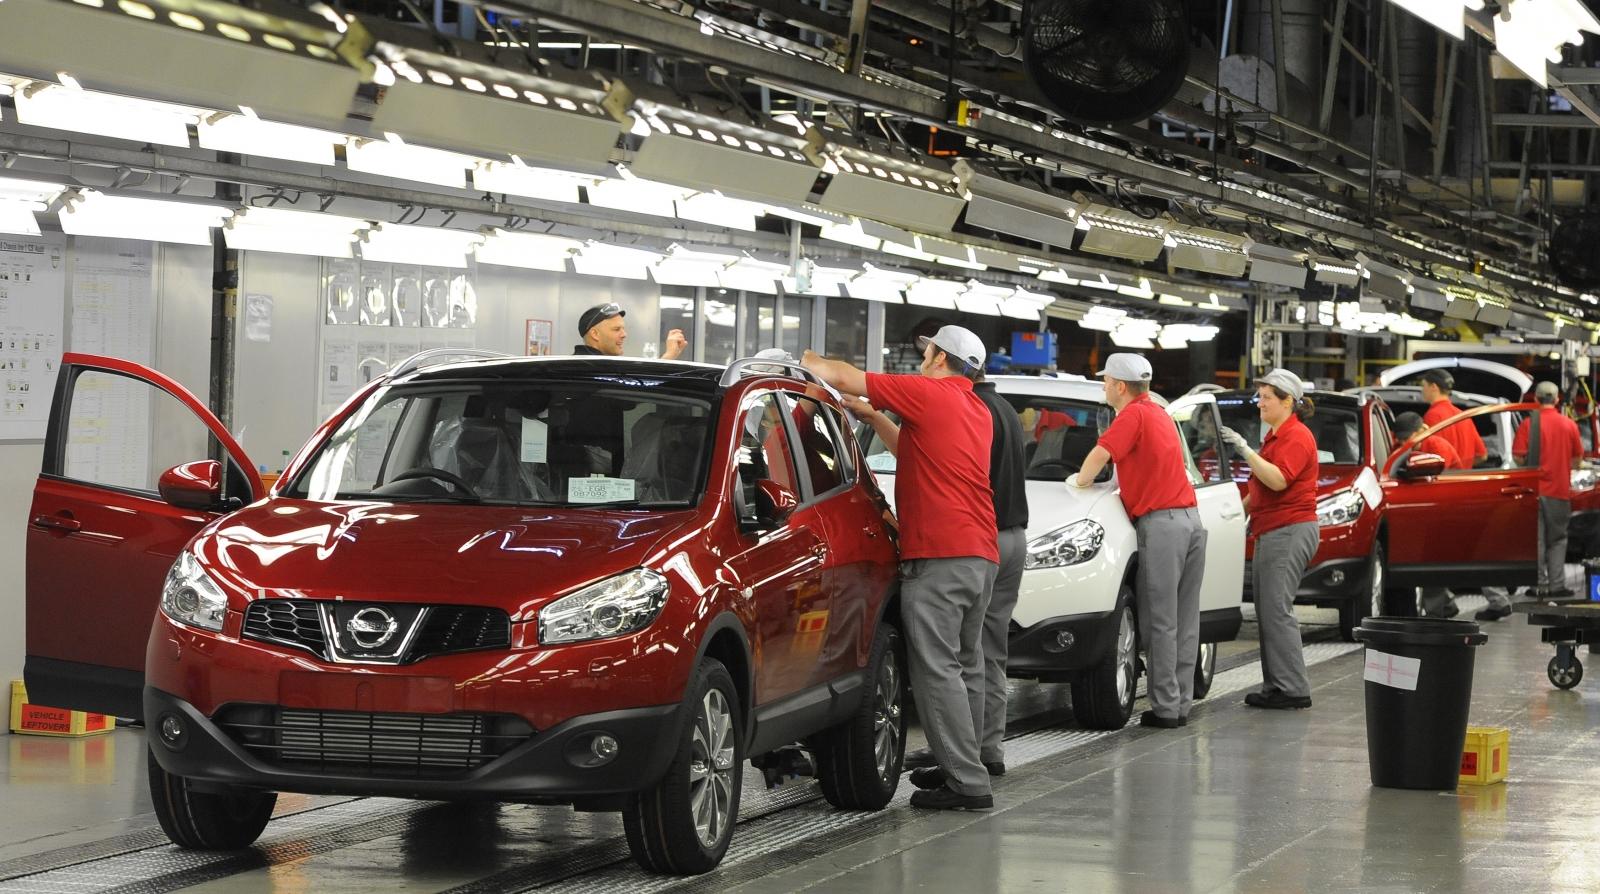 Nissan car plant, Sunderland